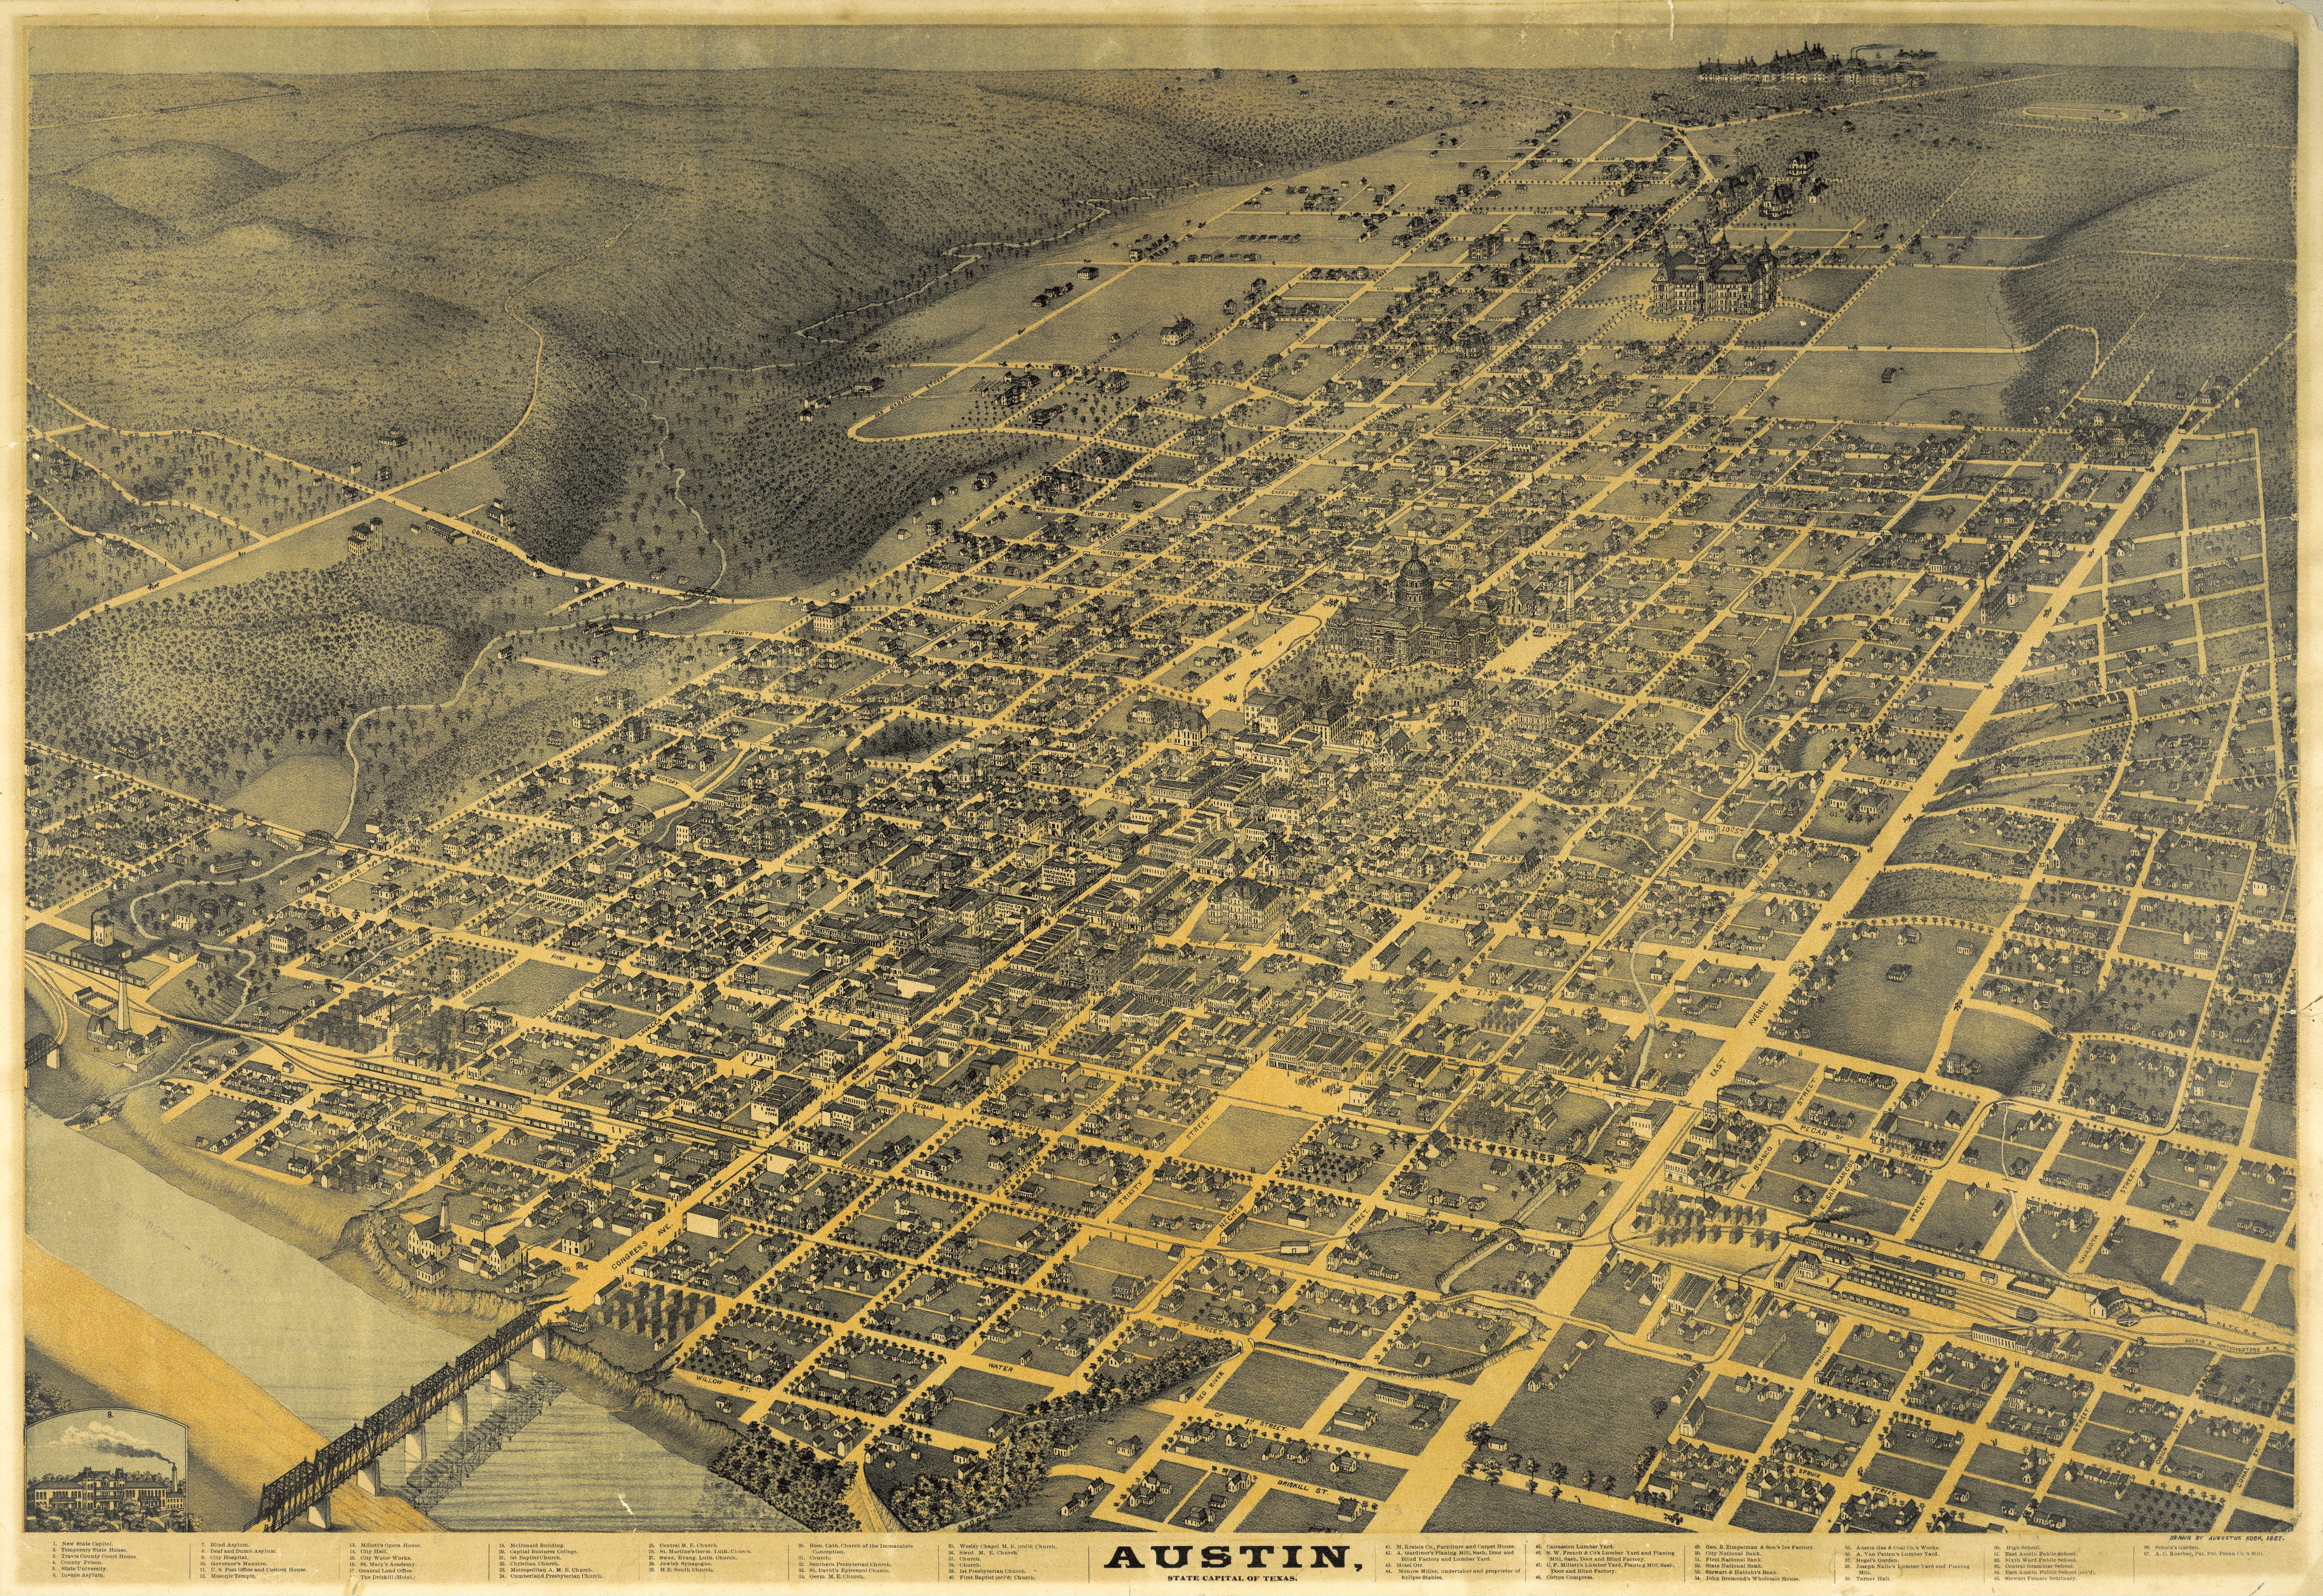 Historical Maps Of Austin Bryker Woods Neighborhood - Historical wall maps